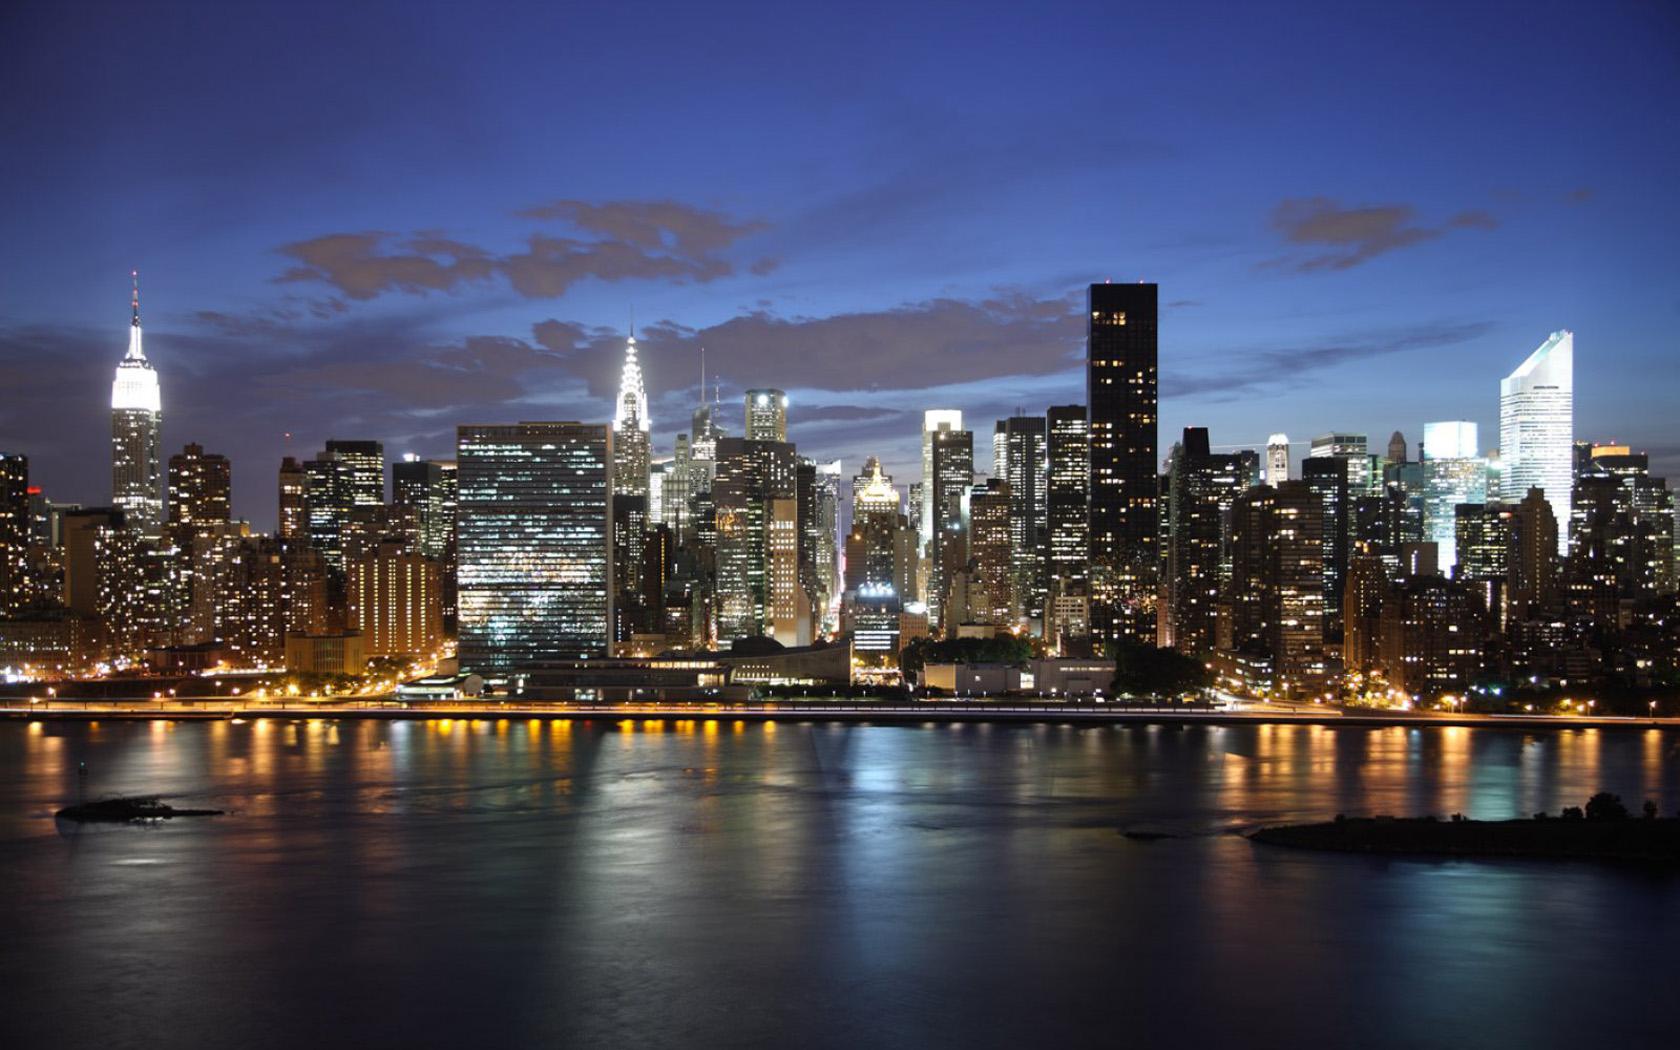 New York Skyline Night Wallpaper Pixel City Hd Wallpaper New York City Skyline Background 1680x1050 Download Hd Wallpaper Wallpapertip